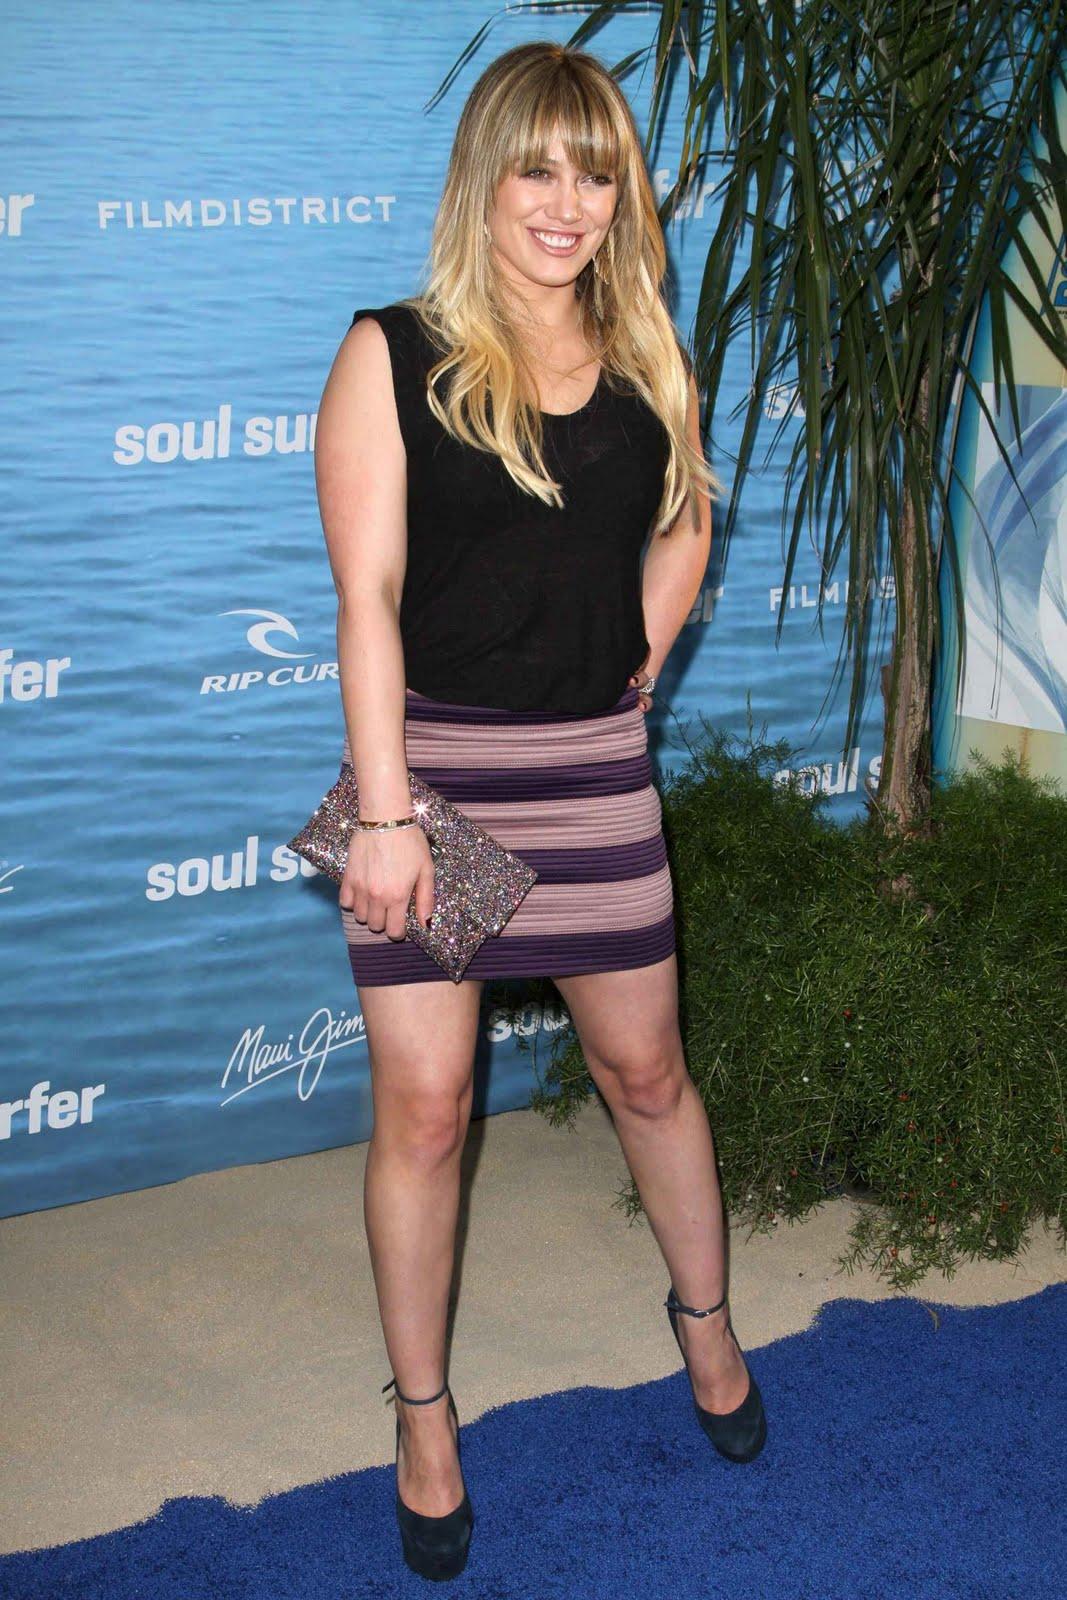 http://3.bp.blogspot.com/-RUNBcisbLg0/TZV87peJQSI/AAAAAAAATik/FDgjKmLtL8s/s1600/Hilary-Duff-18.jpg